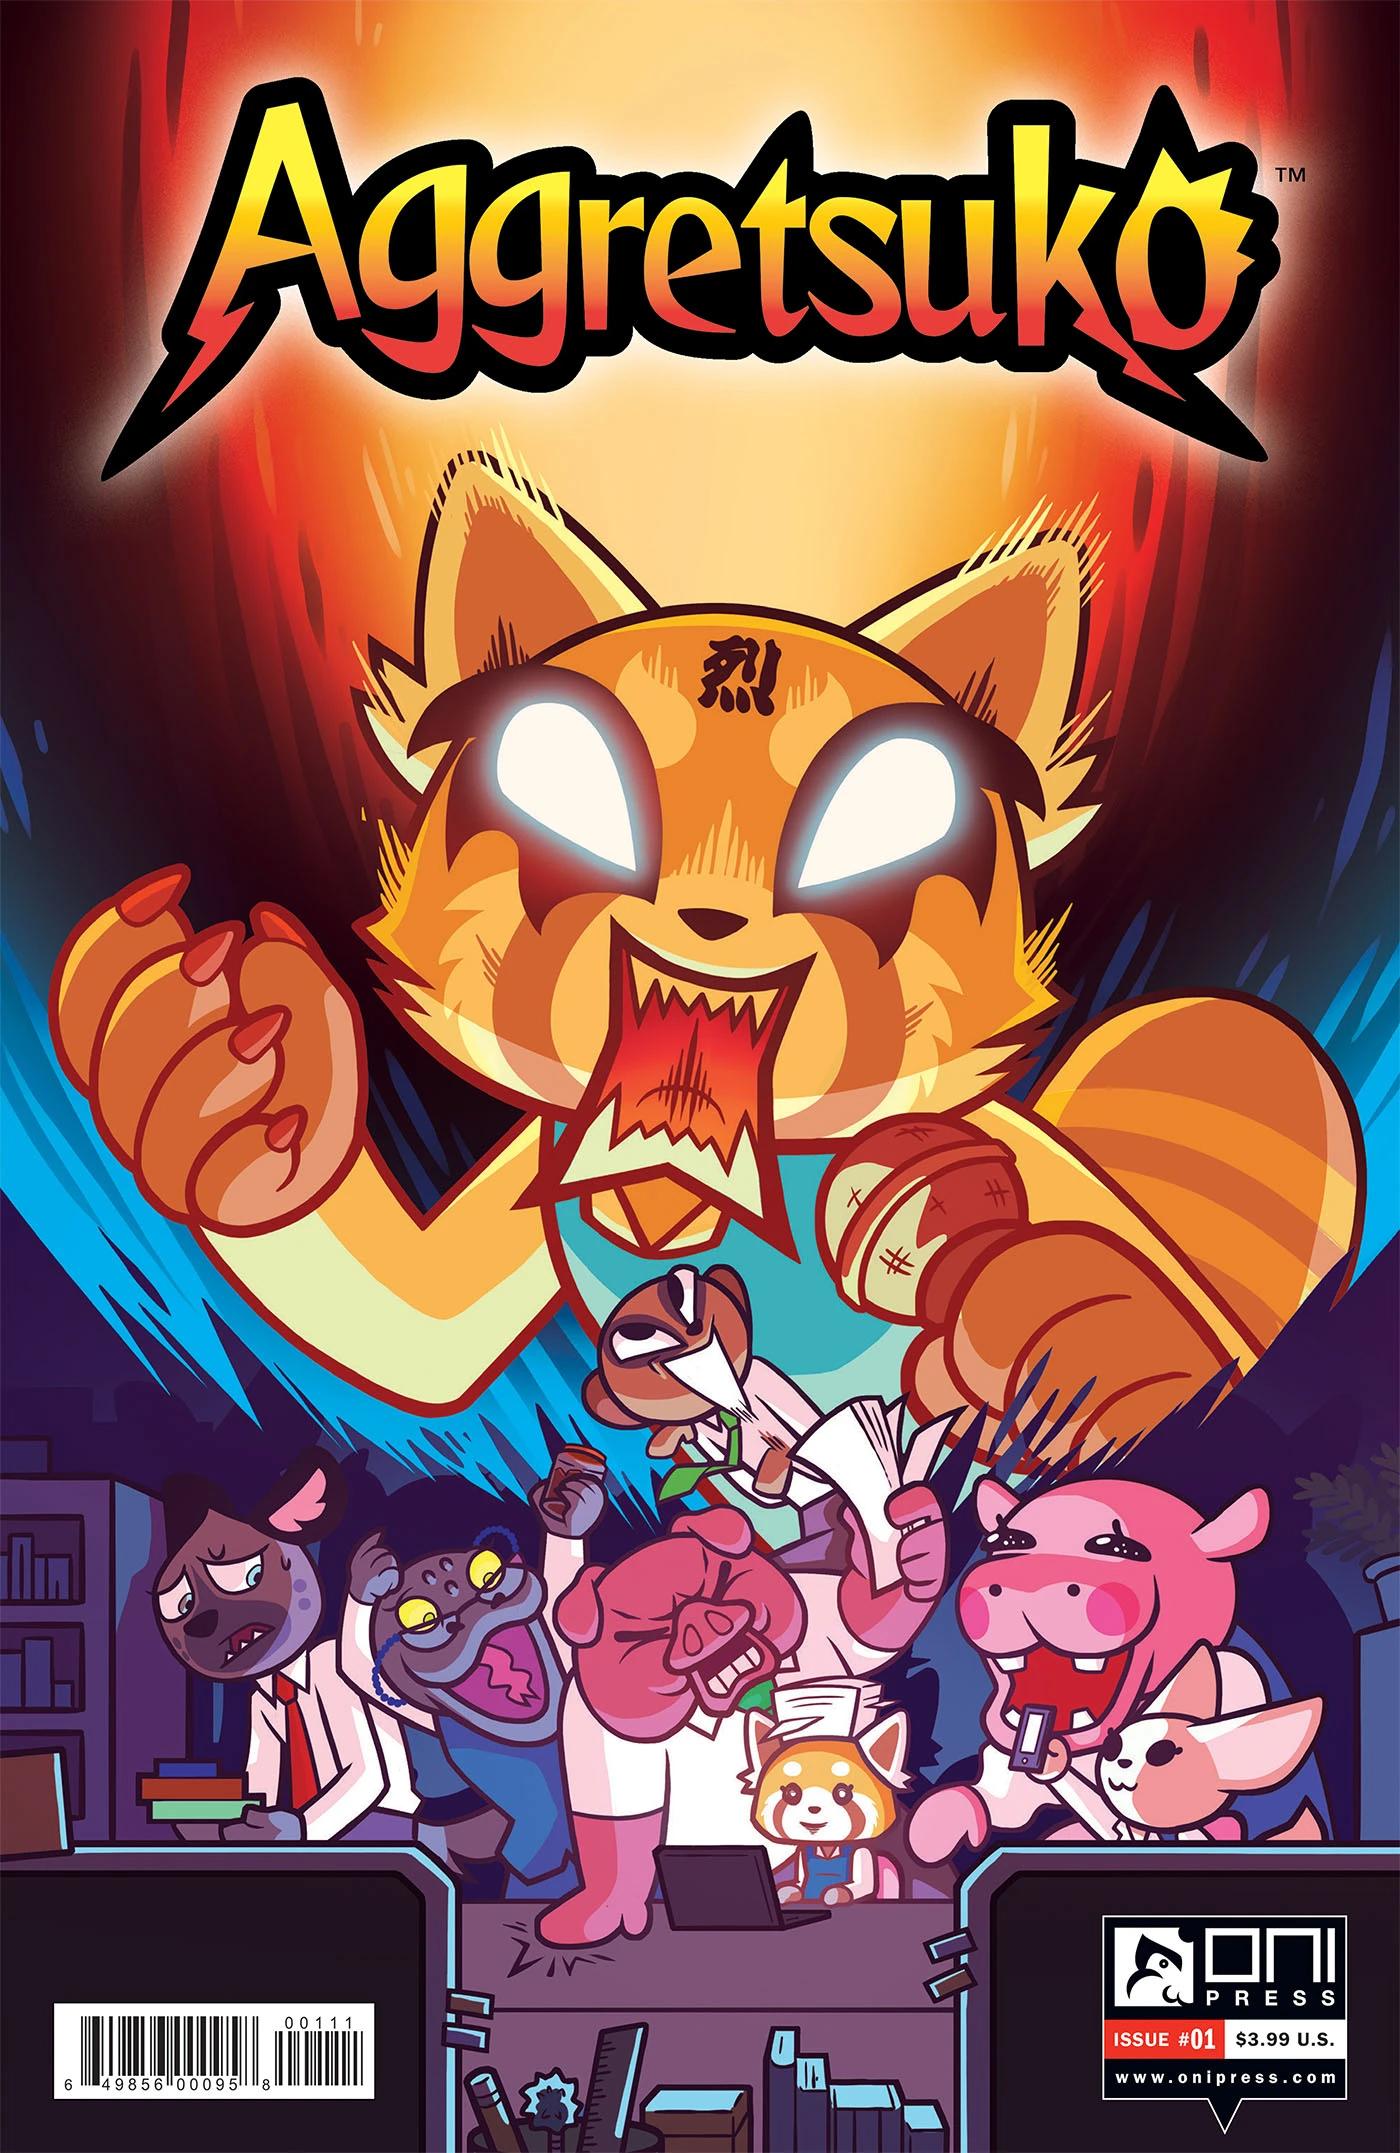 Aggretsuko Comic Issue1 CoverA.jpg